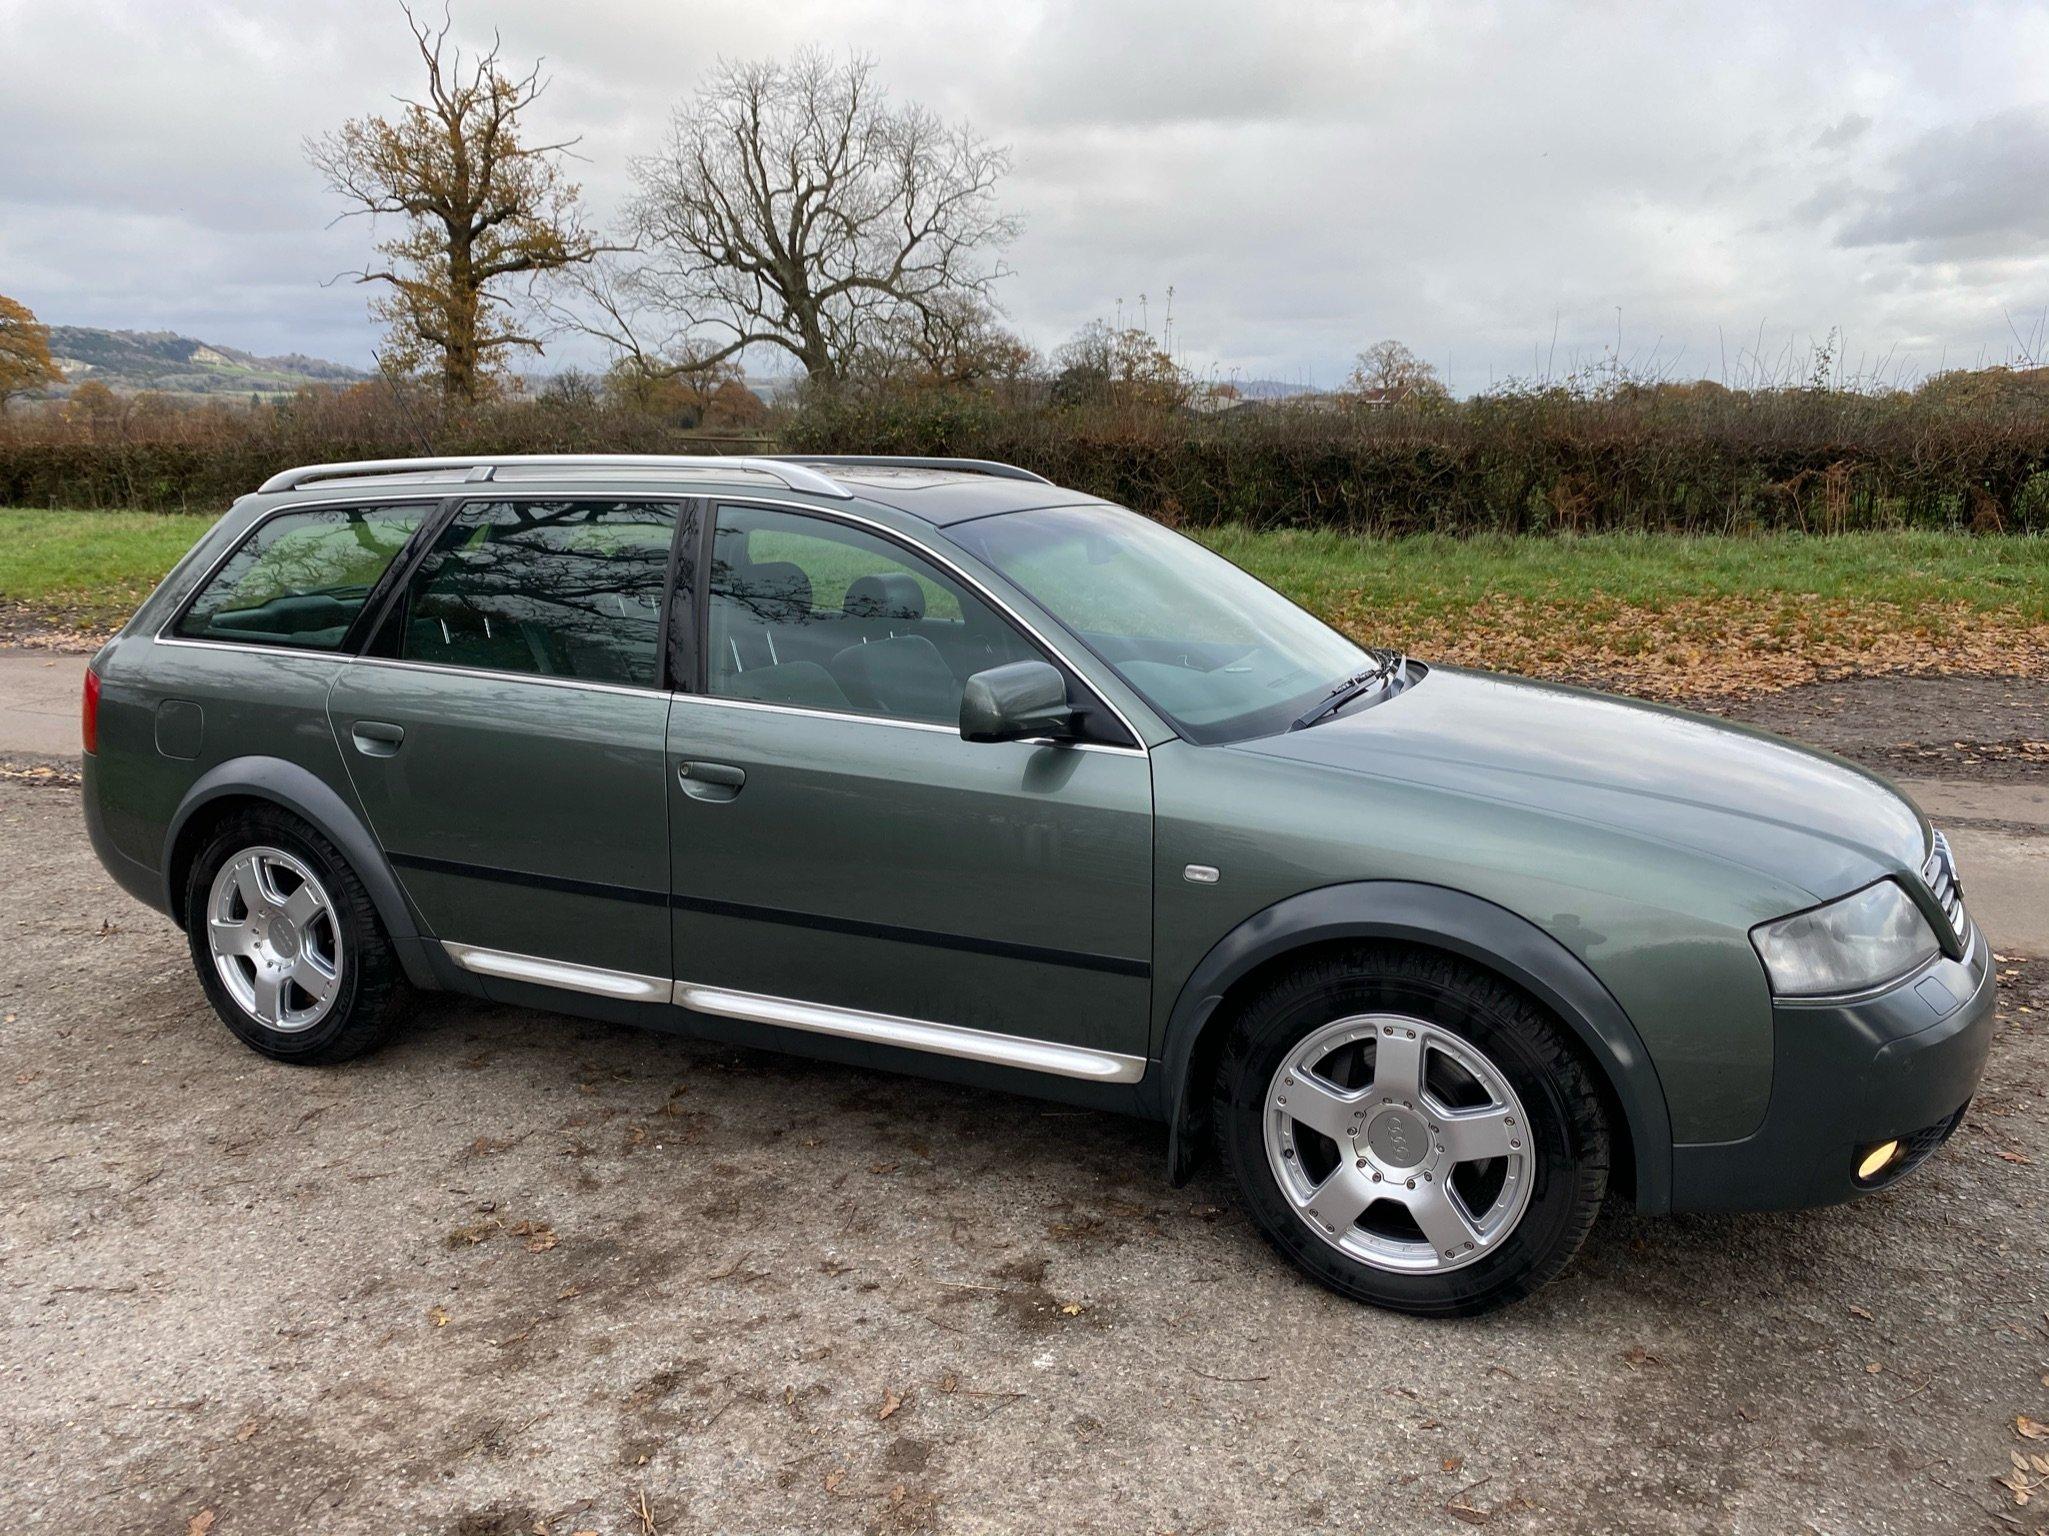 Immaculate, fully overhauled Audi Allroad